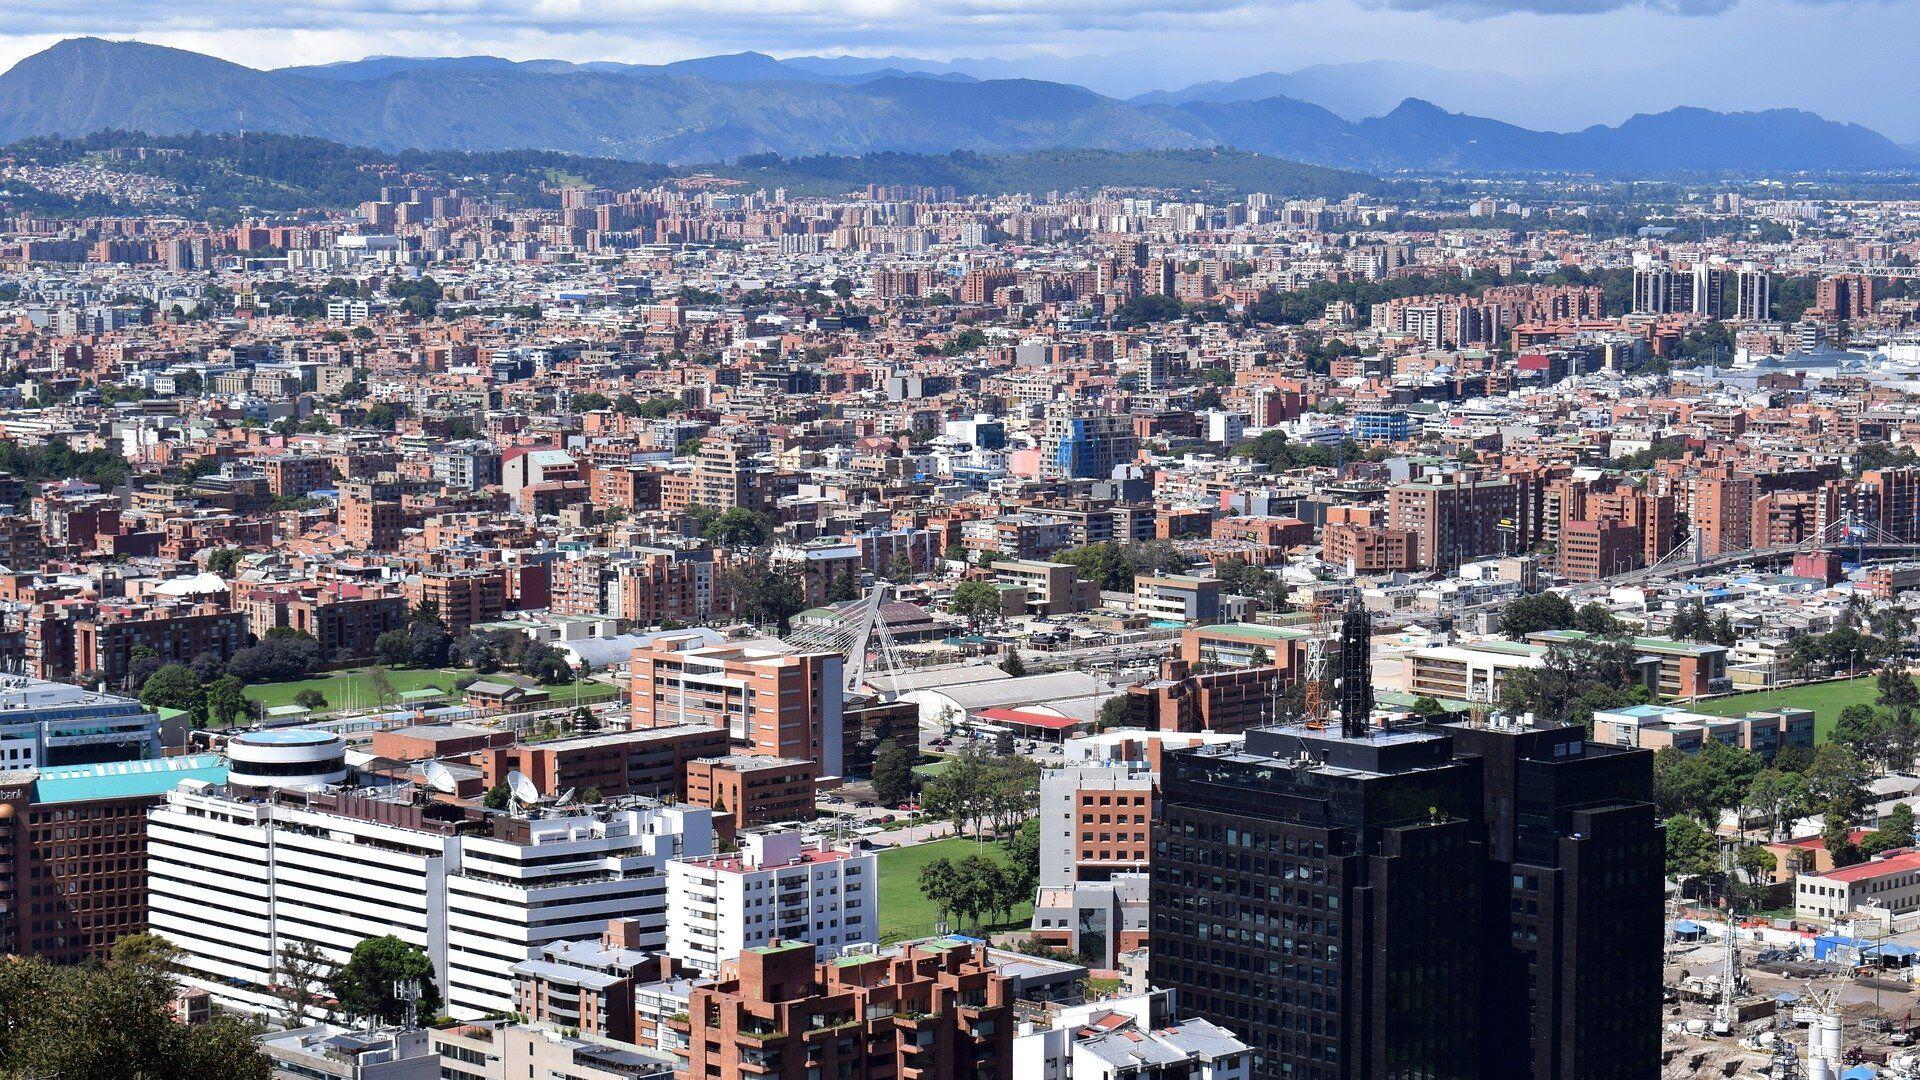 Bogotá, la capital de Colombia - Sputnik Mundo, 1920, 14.04.2021